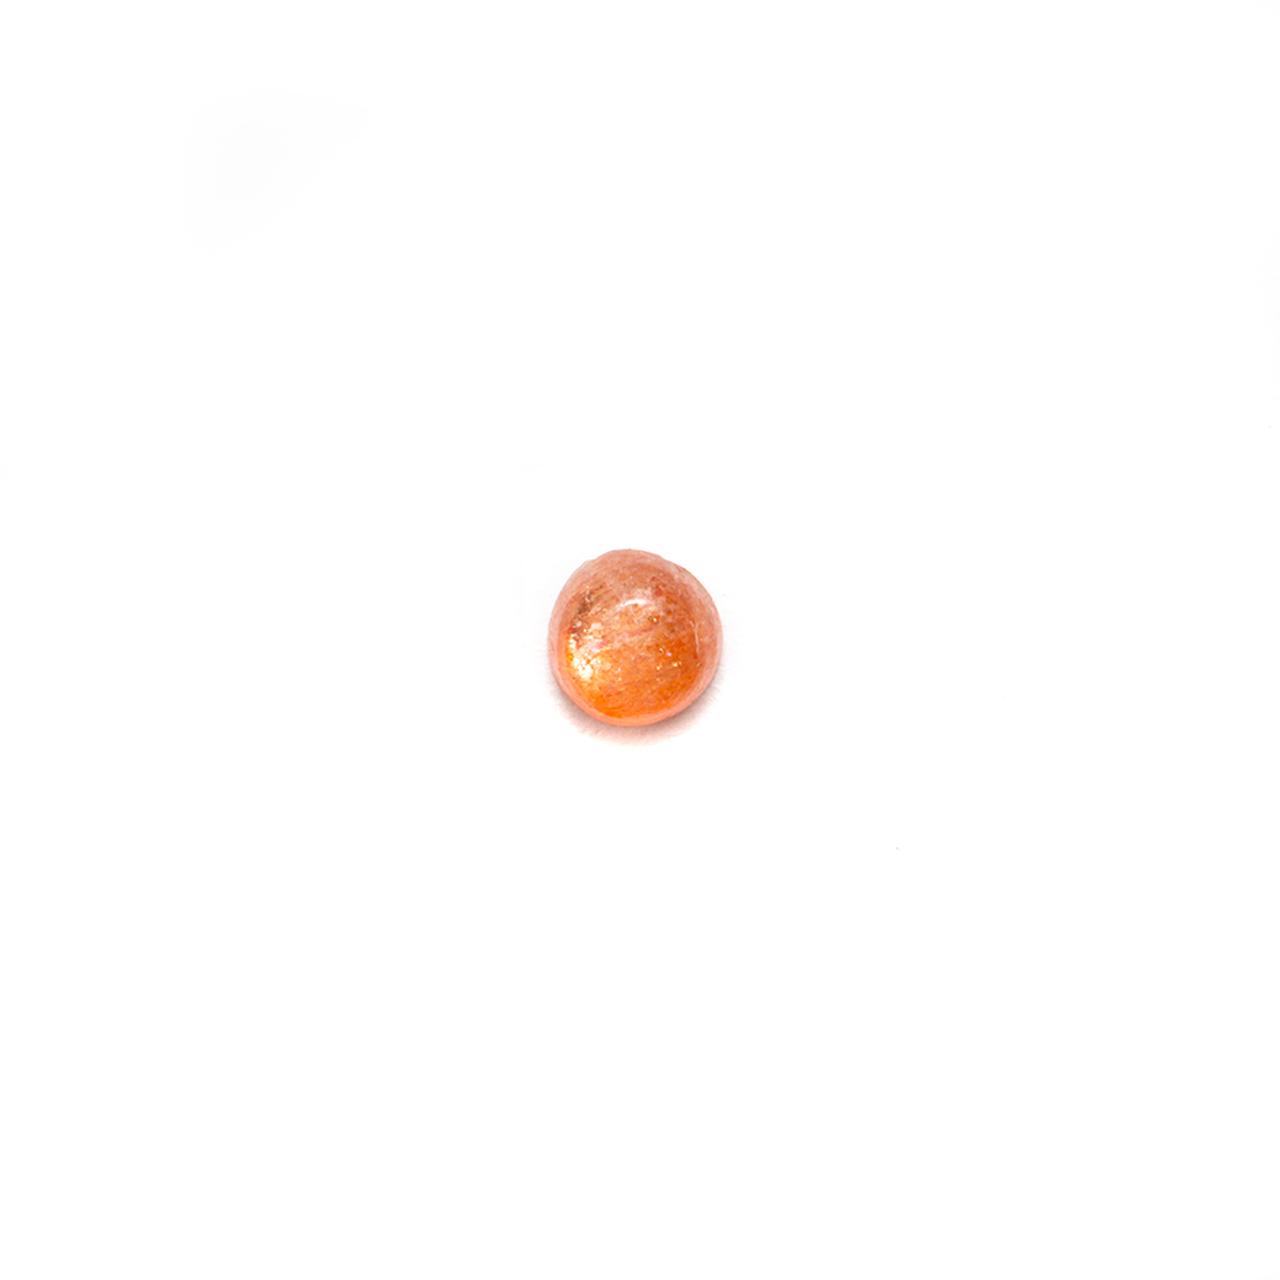 Round Cabochon - Sunstone - 3mm